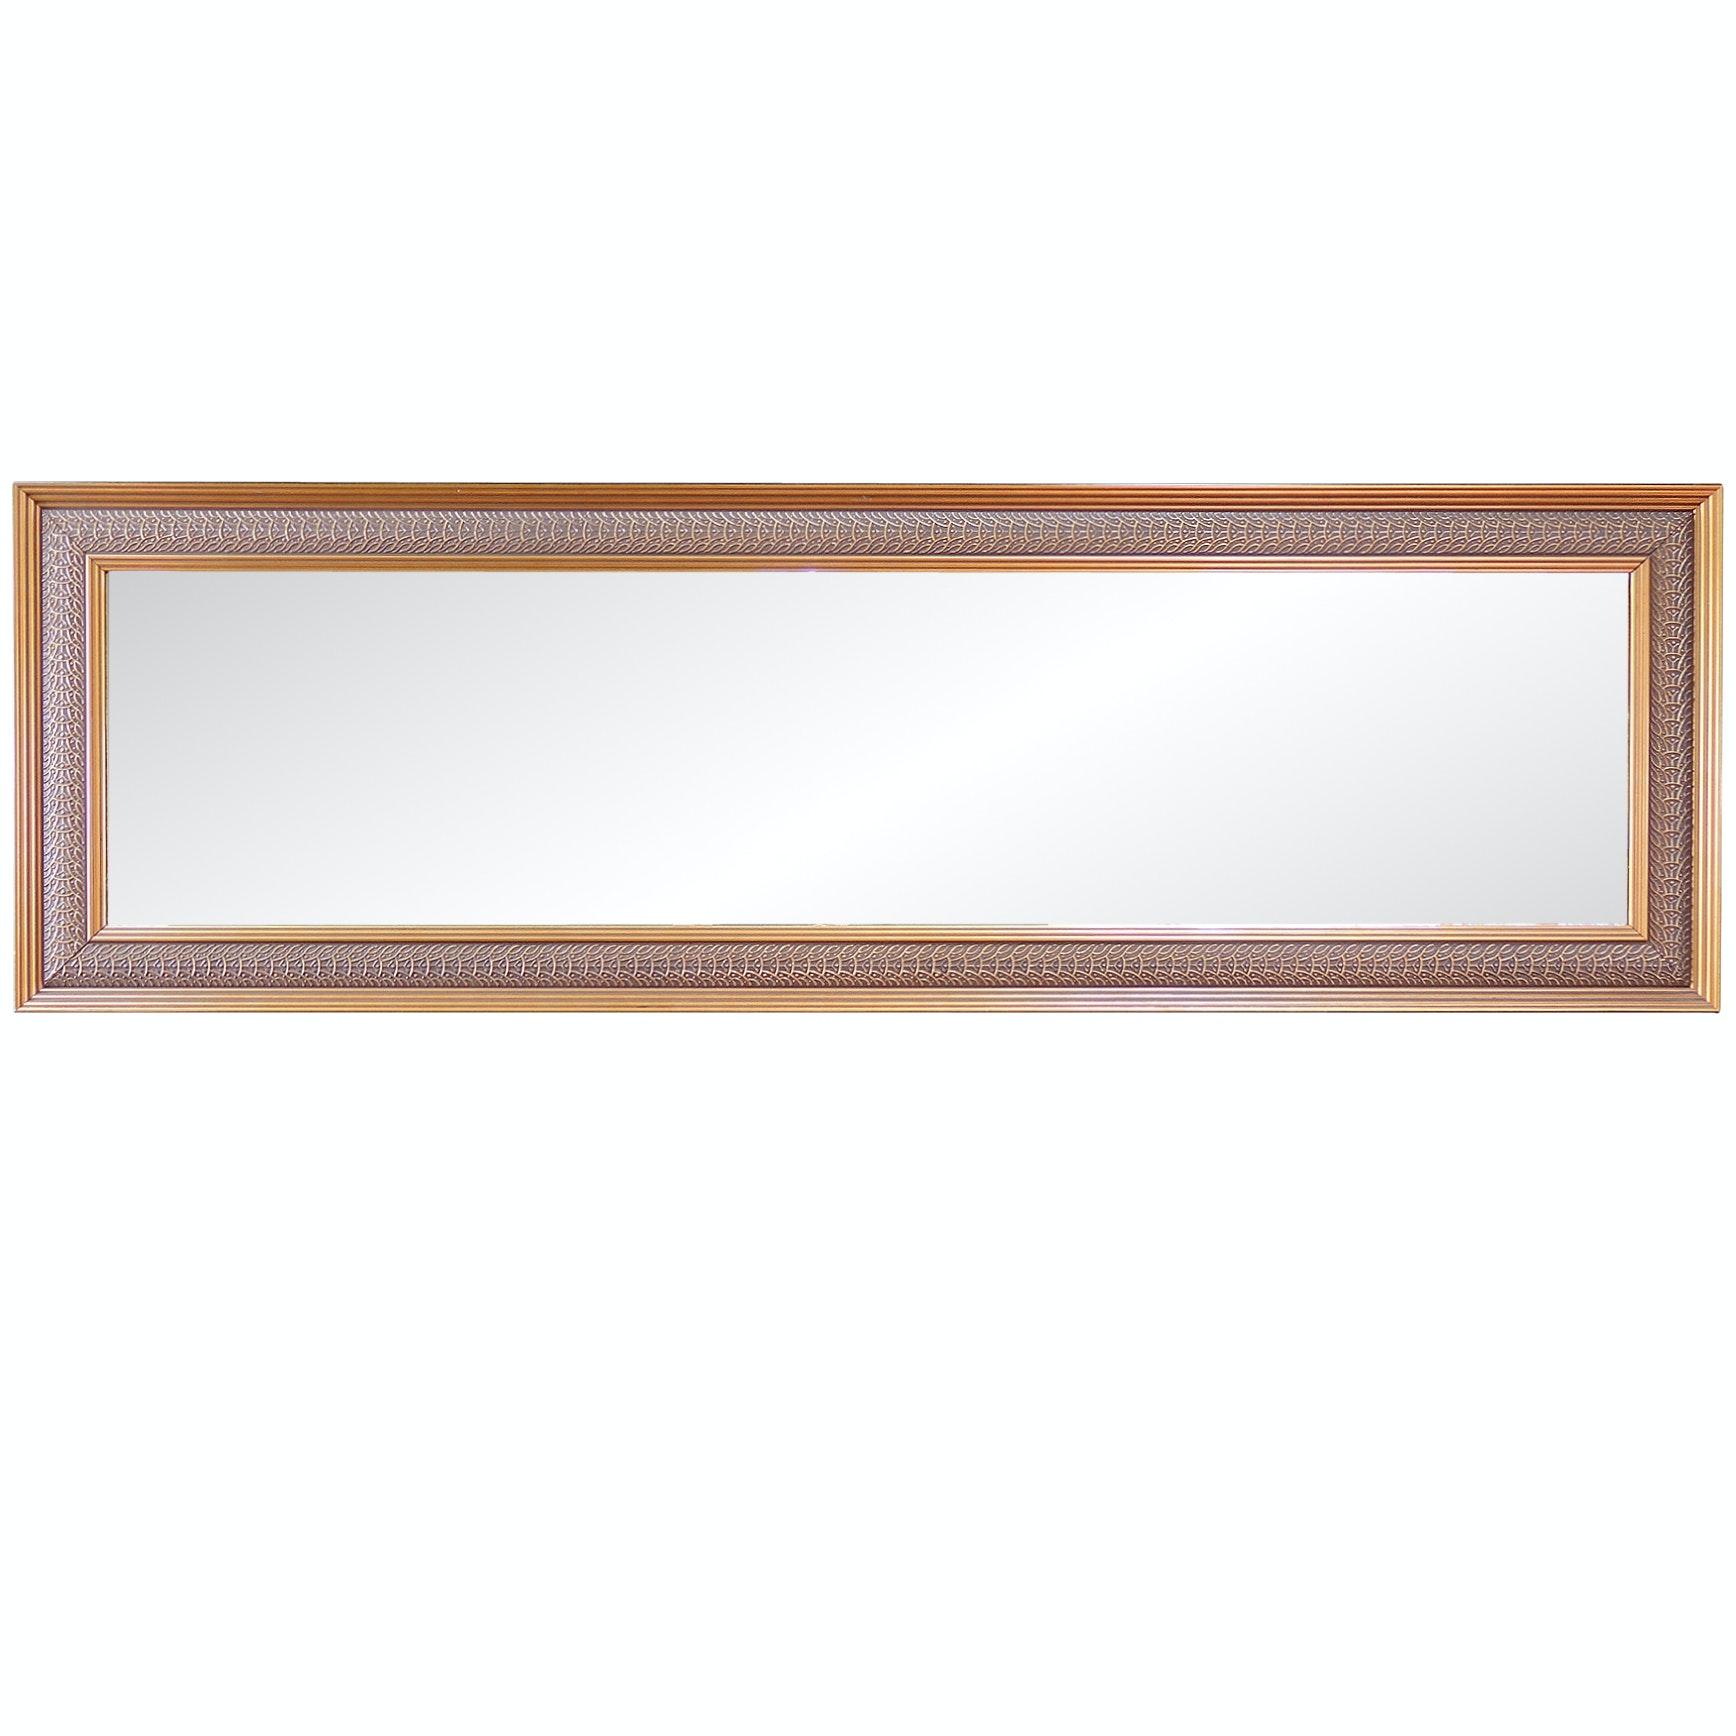 Beveled Overmantel Mirror, Contemporary